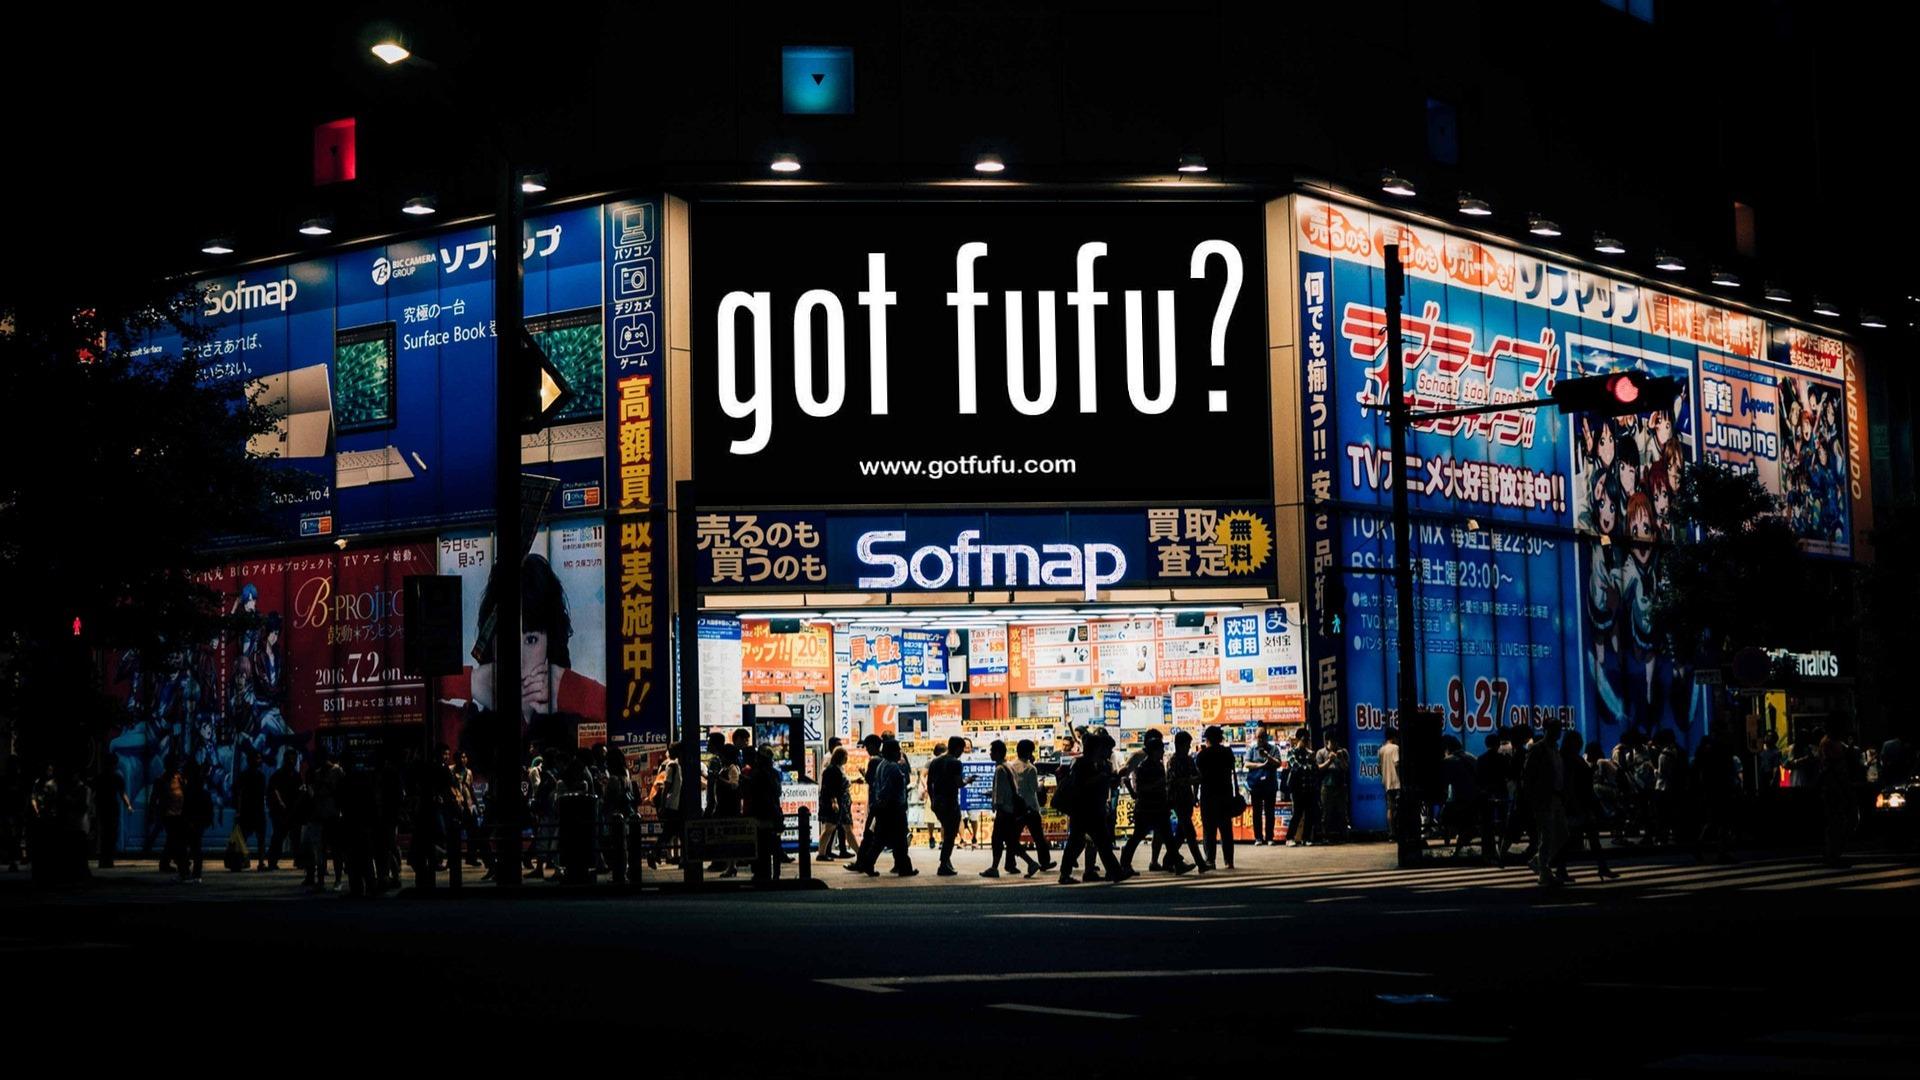 GOT FUFU Clothing - Billboard Mockup